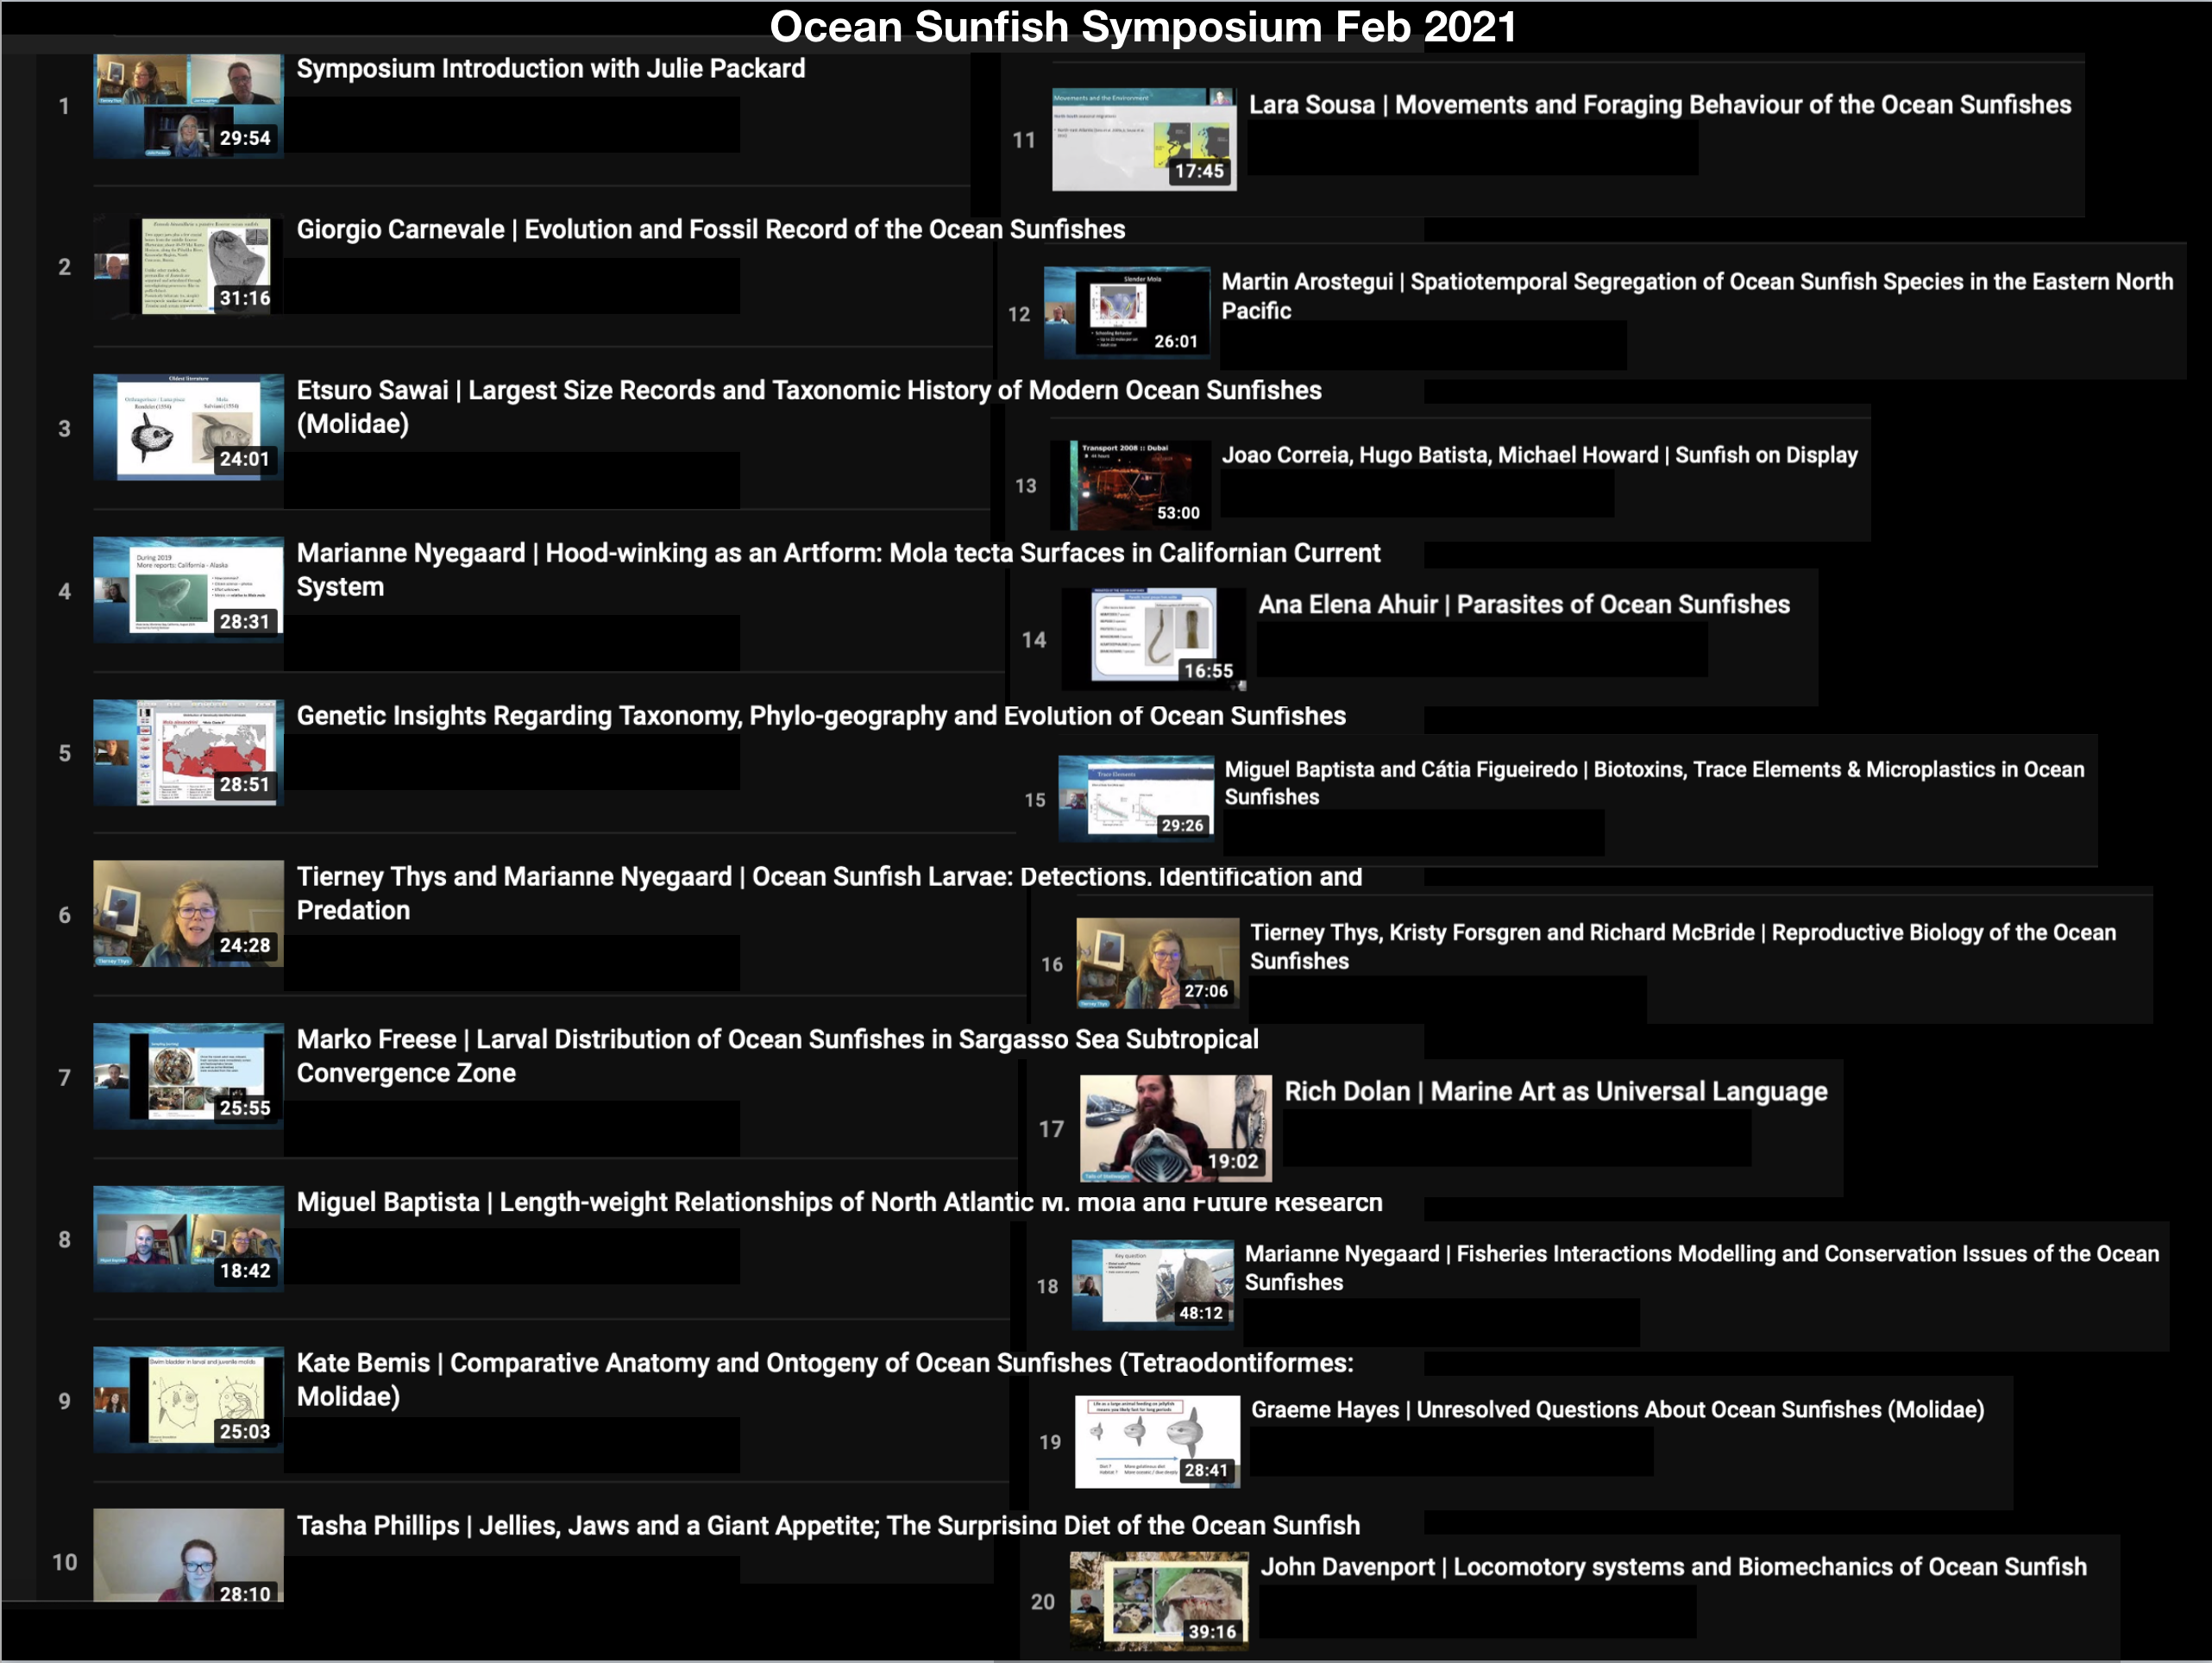 Image link to Ocean Sunfish Symposium video playlist